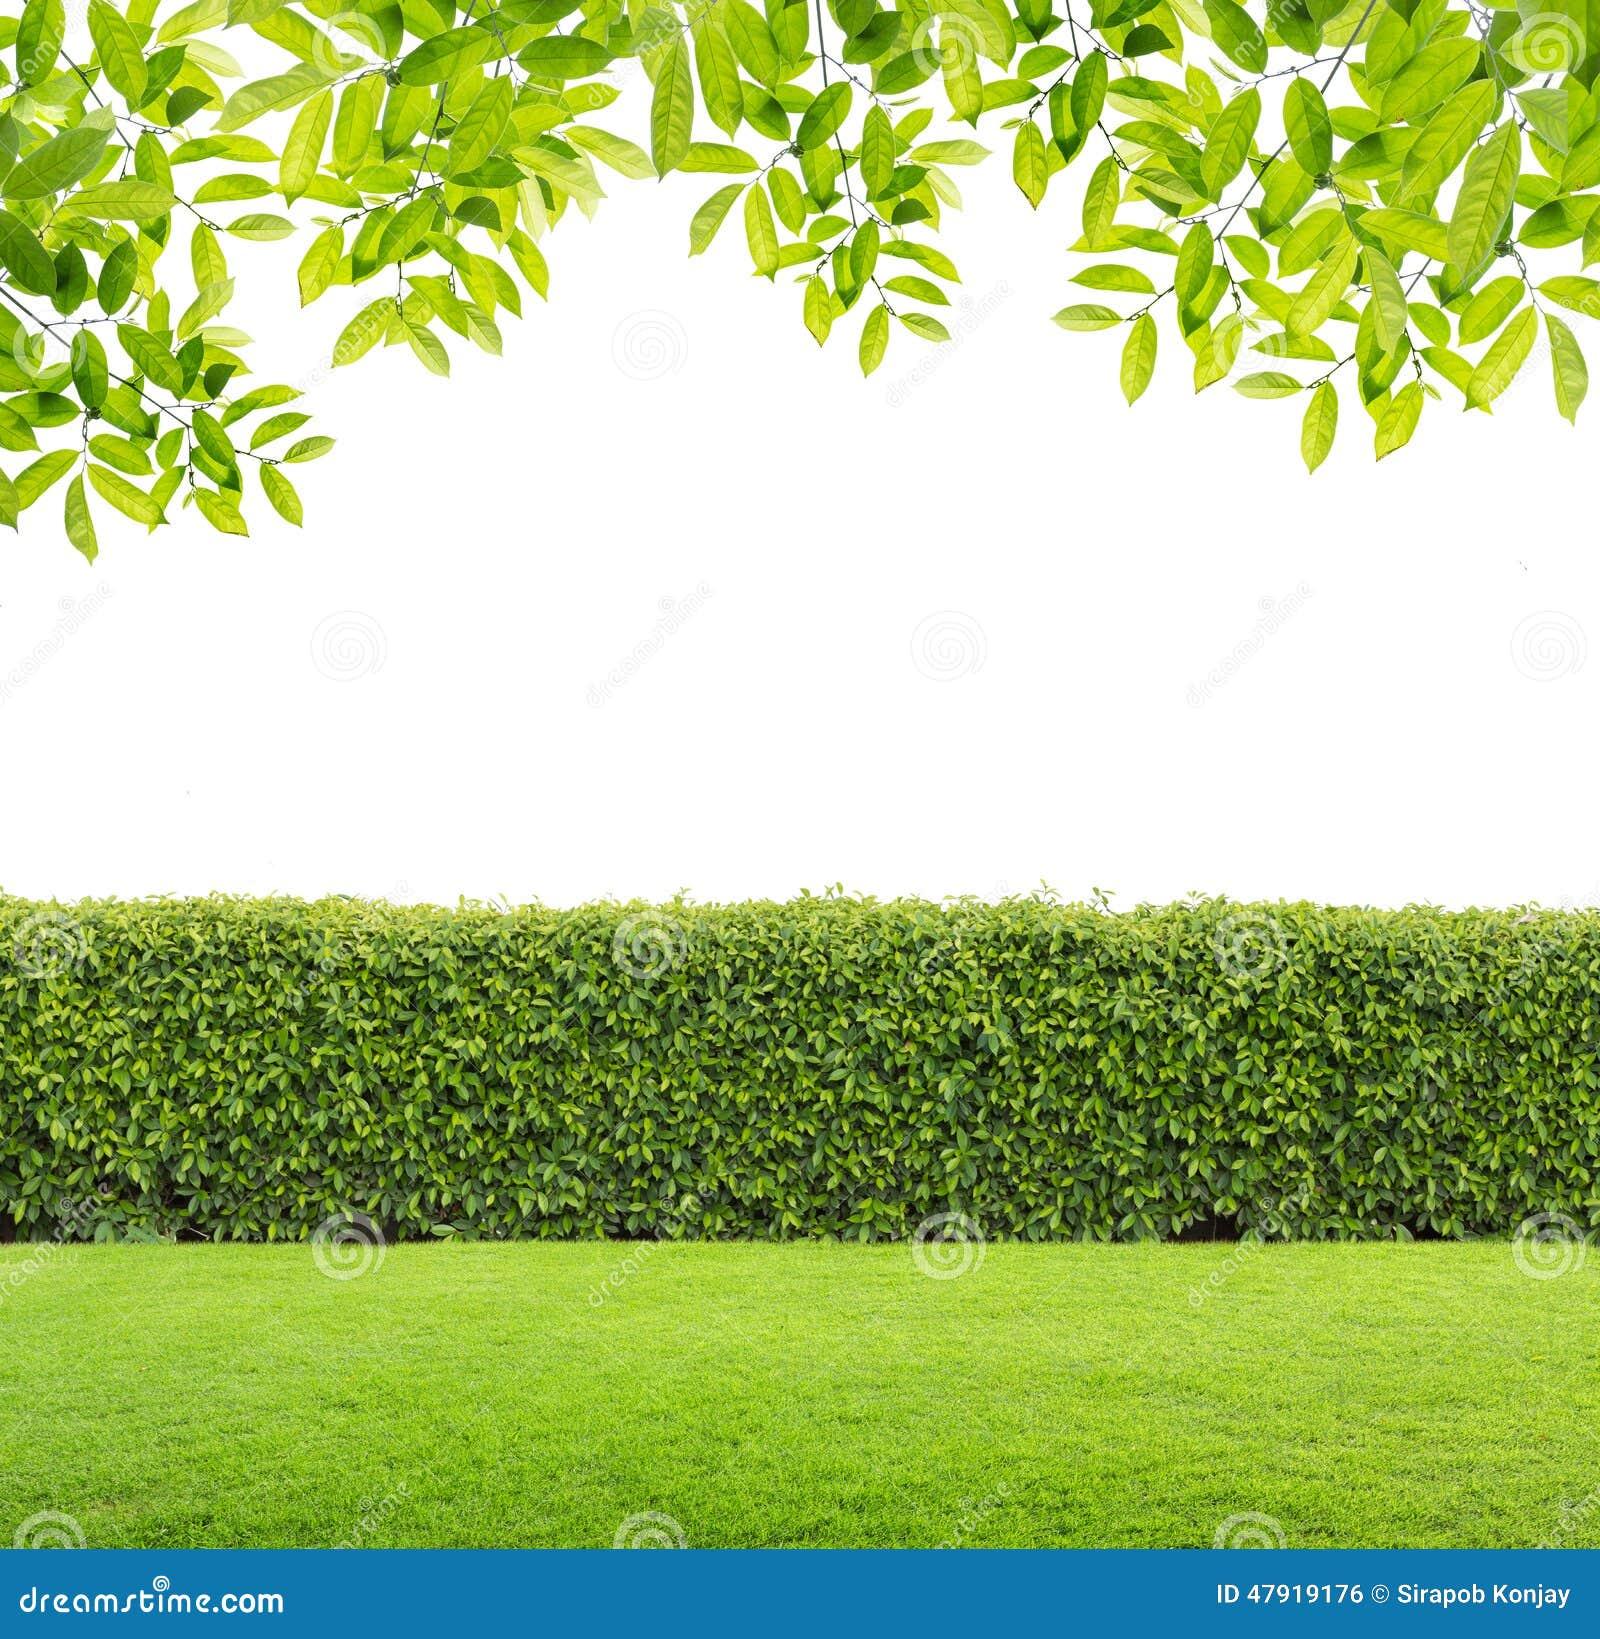 When to Hedge Portfolio